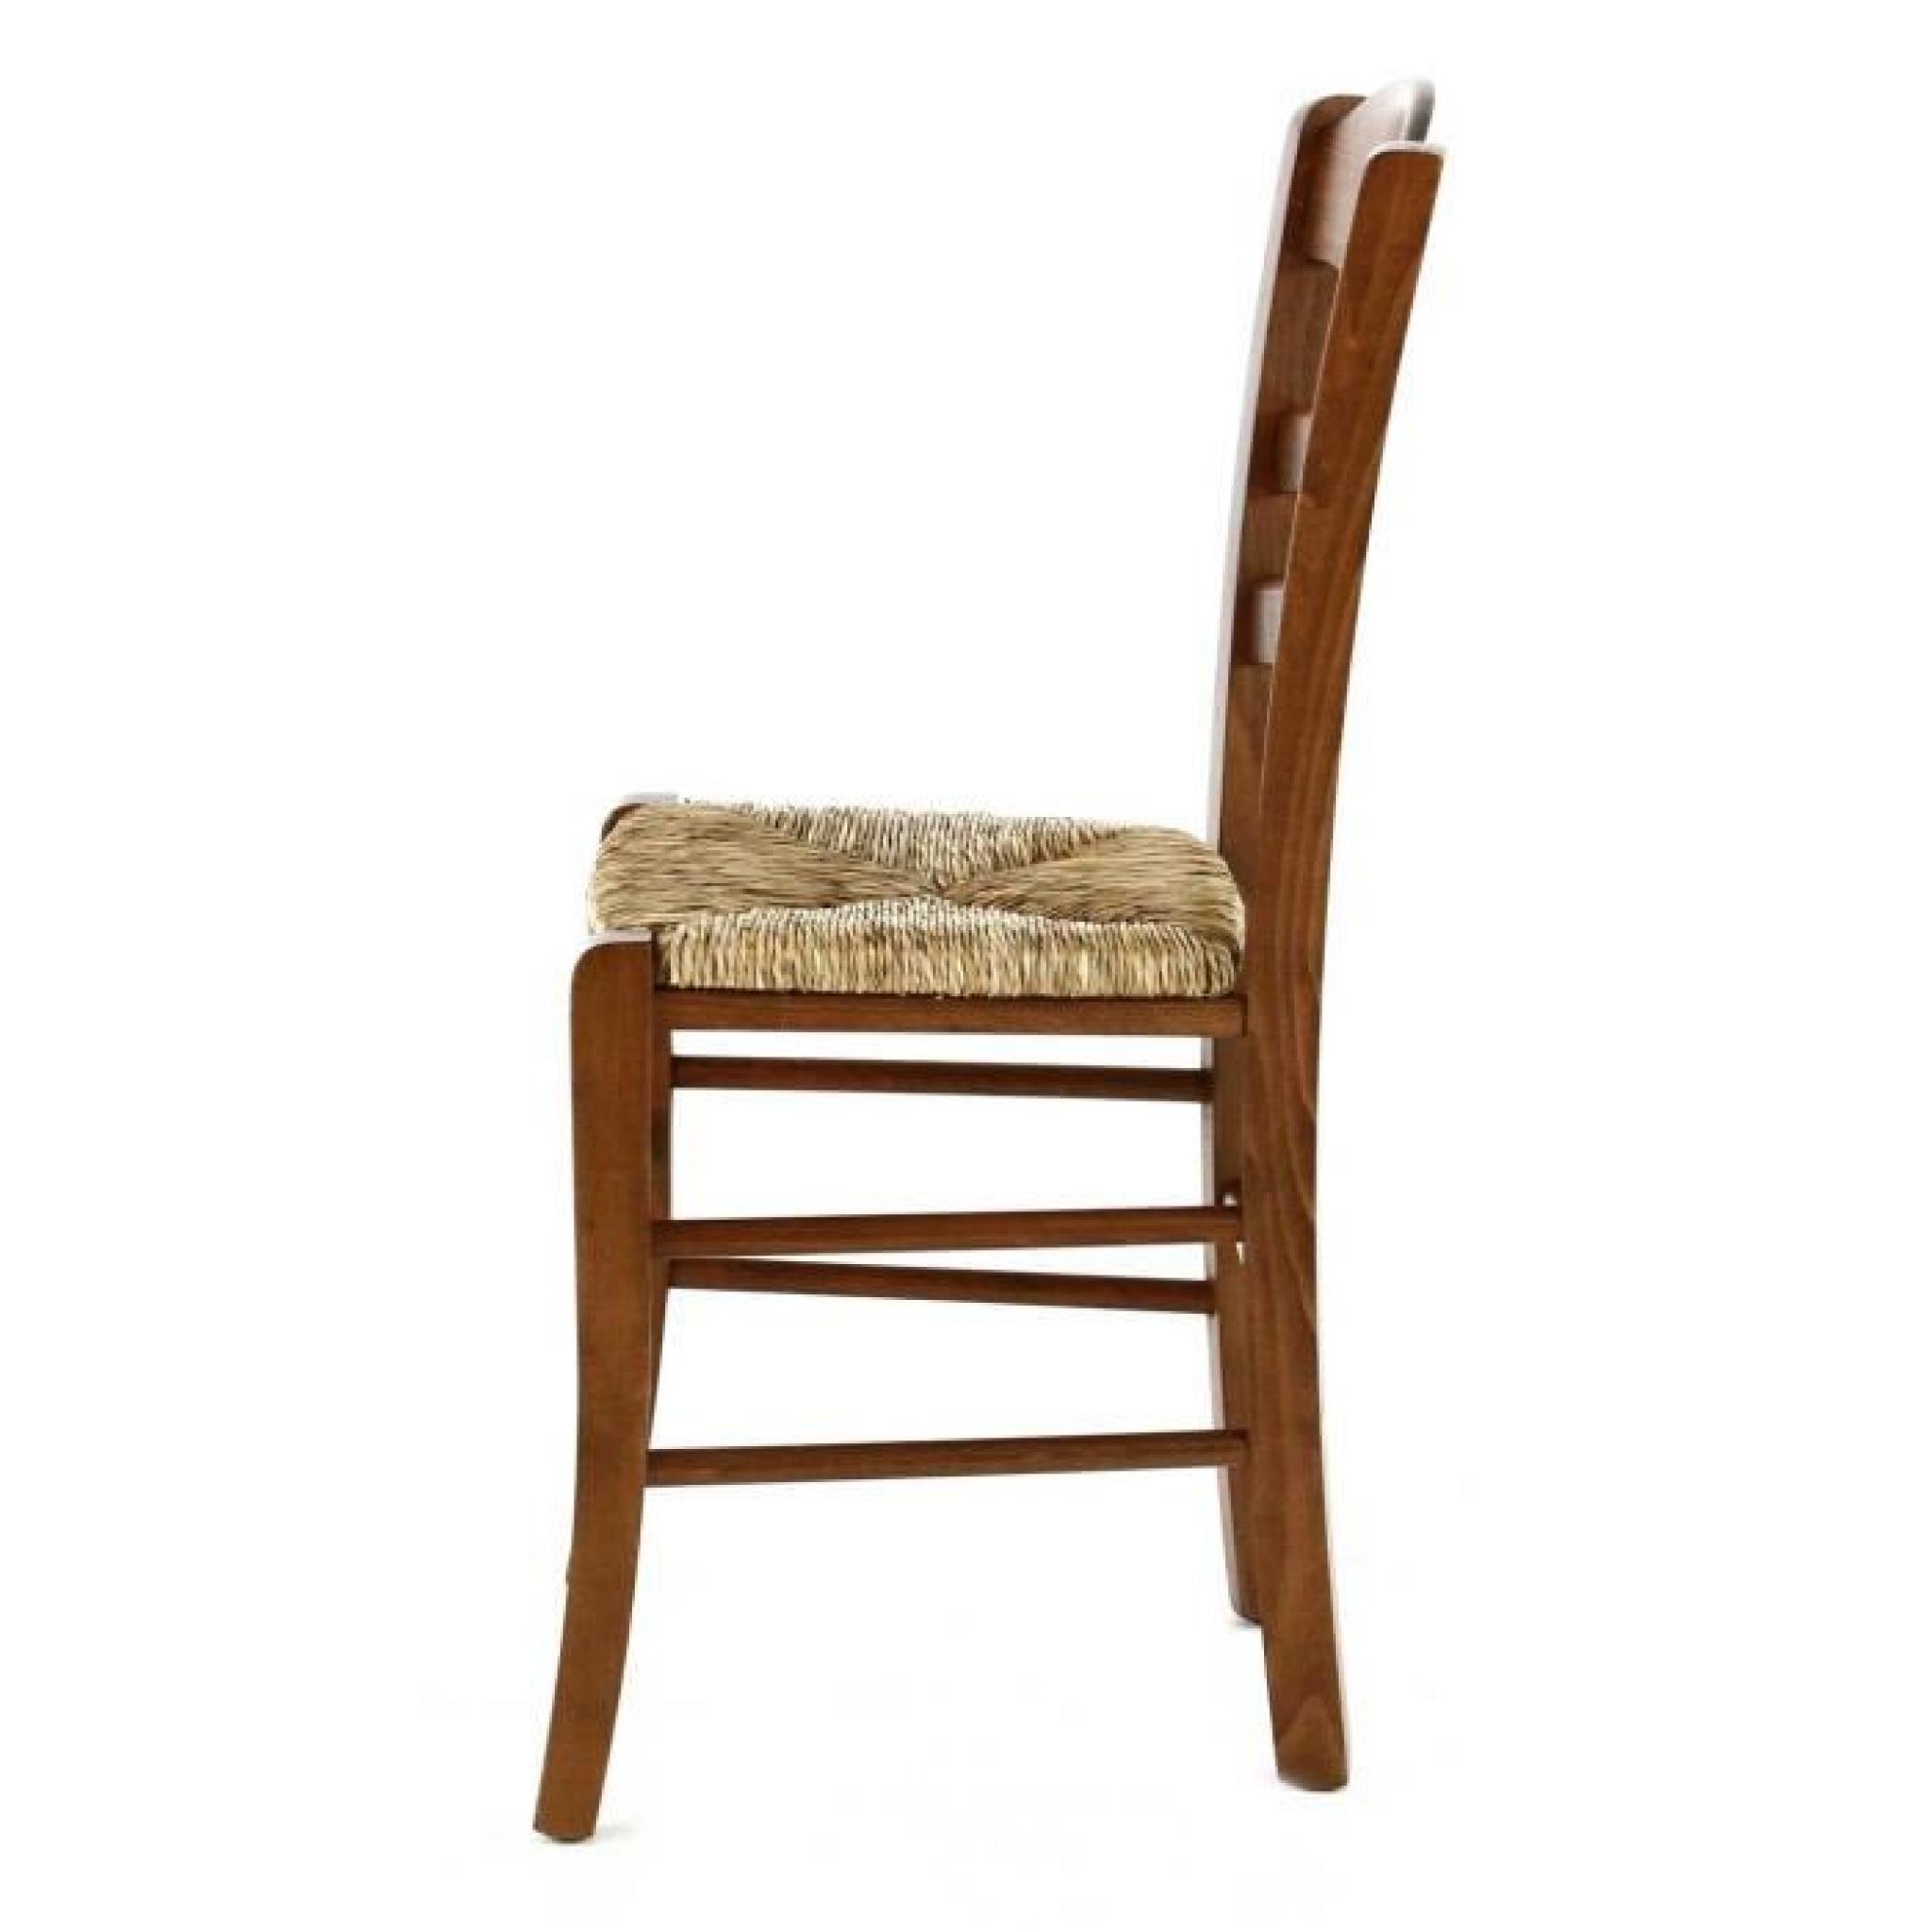 2 x chaise htre massif cusson assise paille vieugy pays pas cher - Chaise Hetre Assise Paille